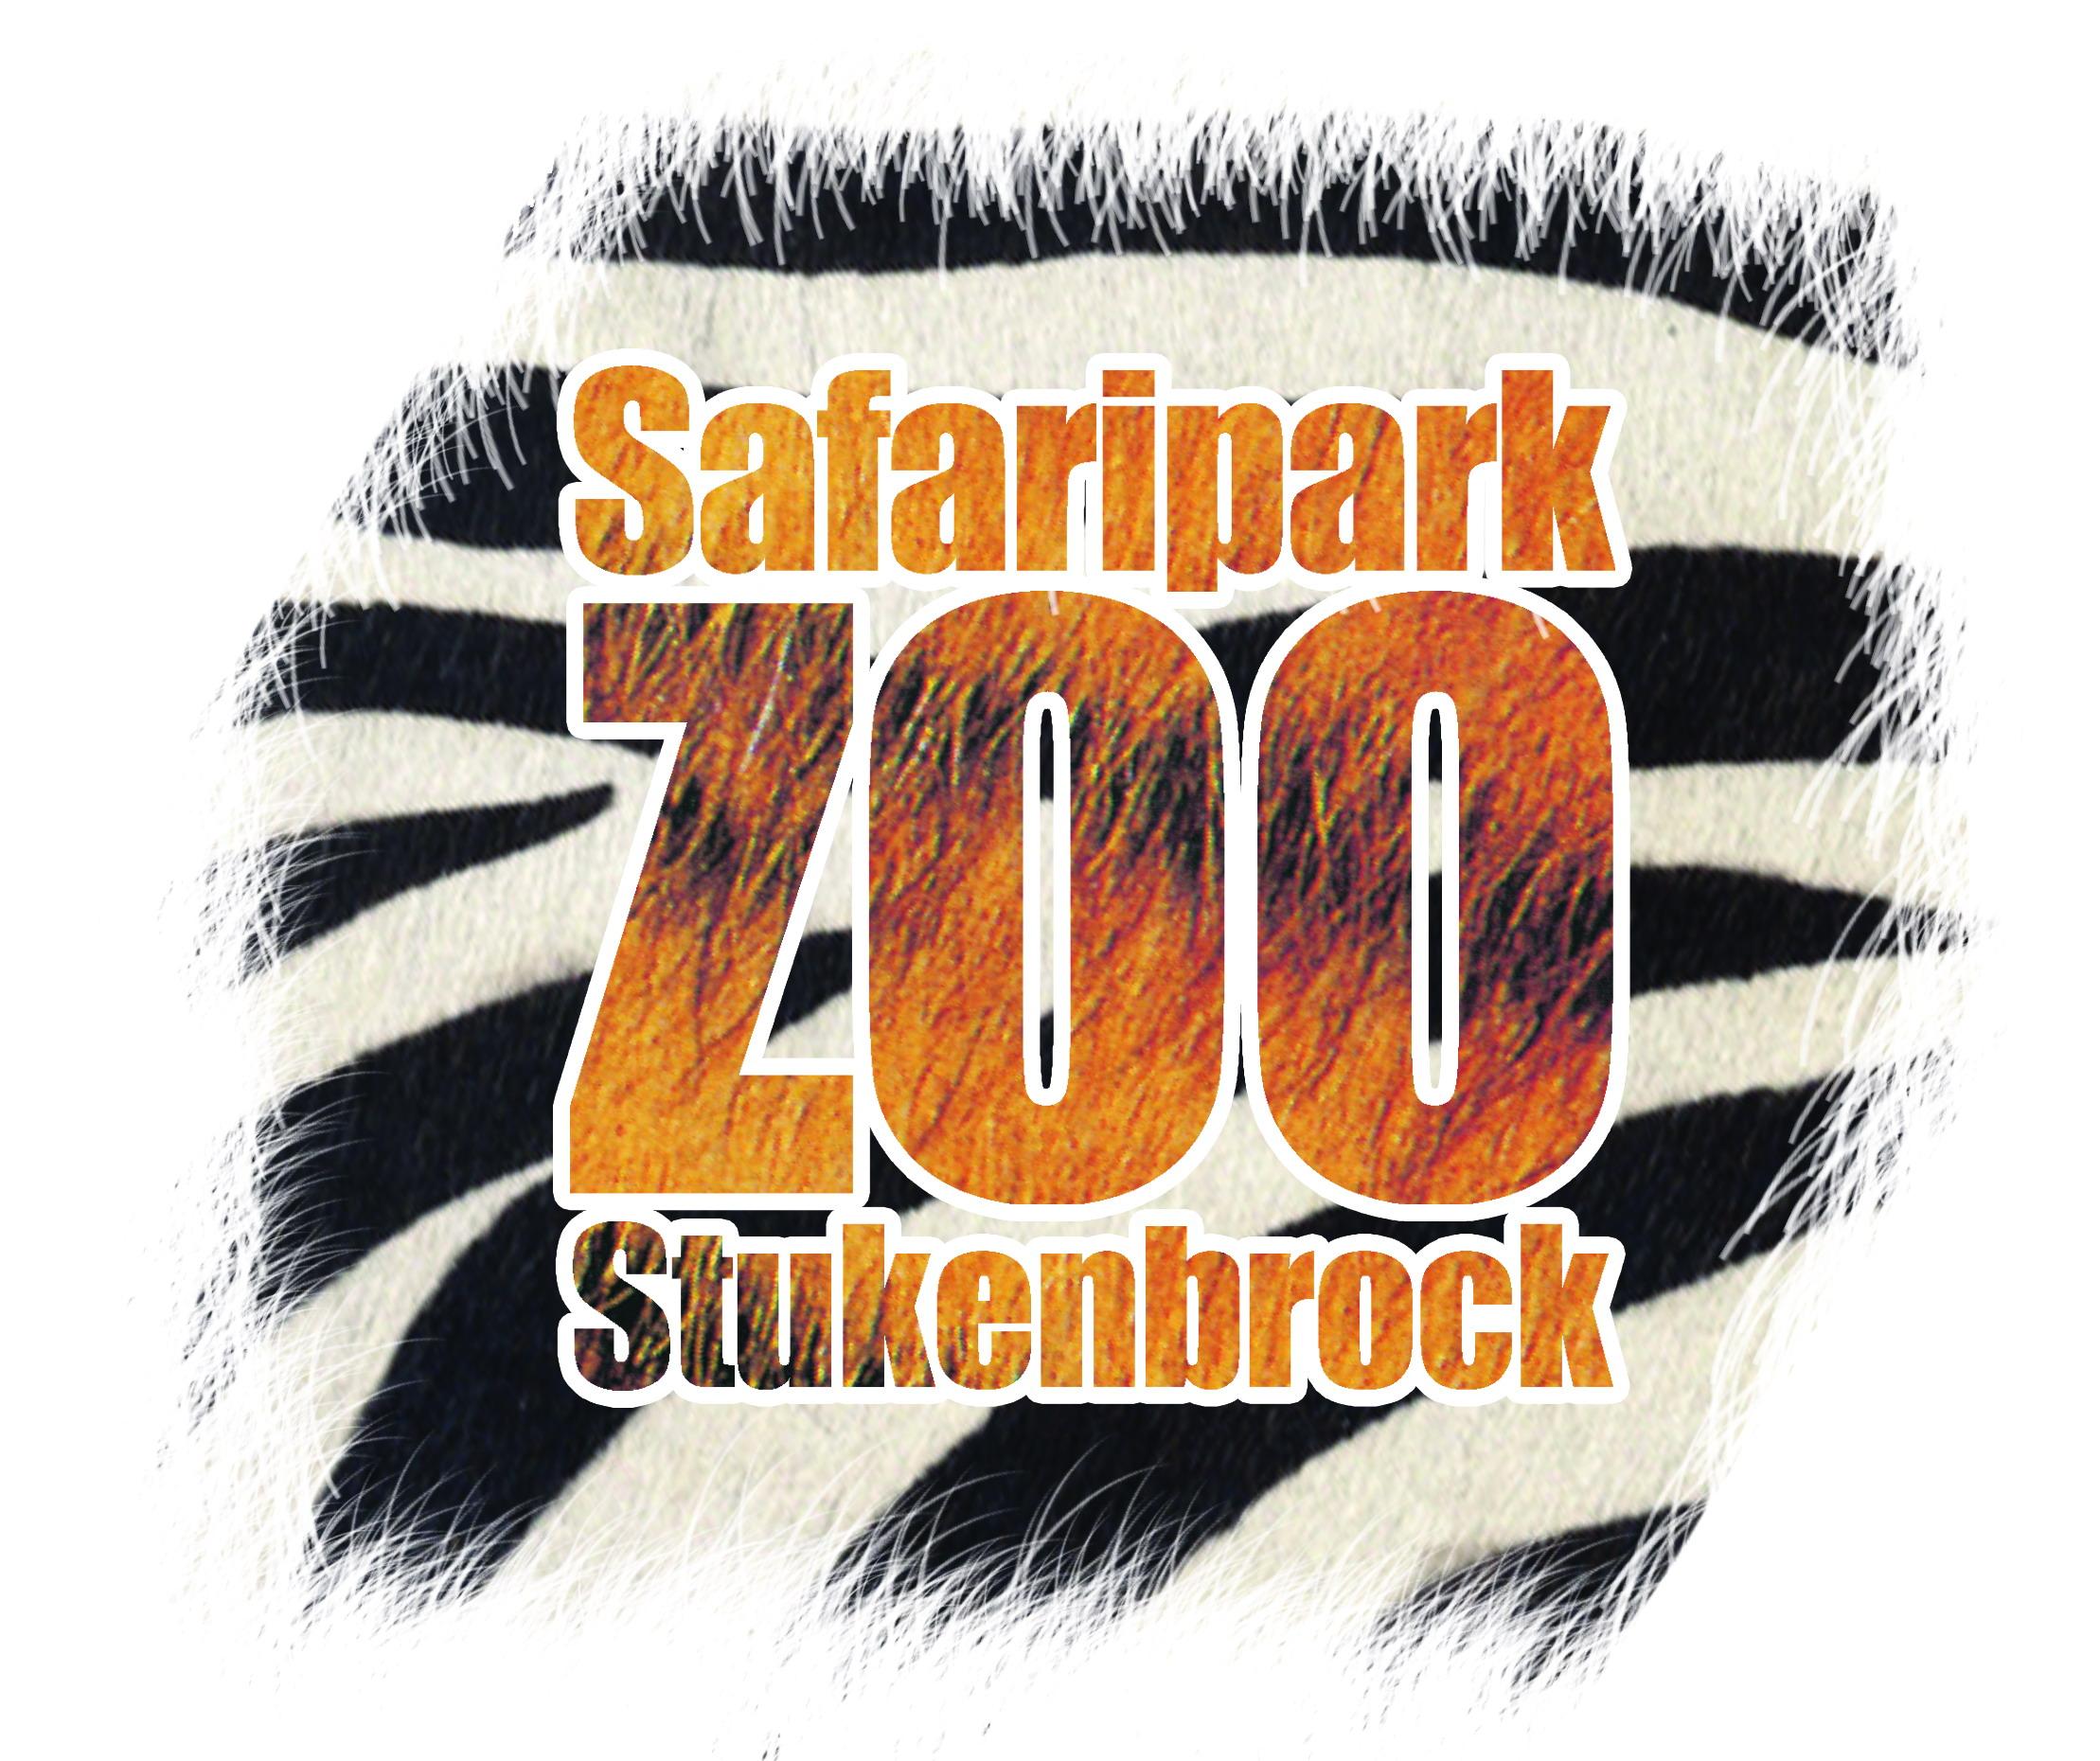 Safaripark Stukenbrock, Mittweg 16, 33758 Schloß Holte-Stukenbrock